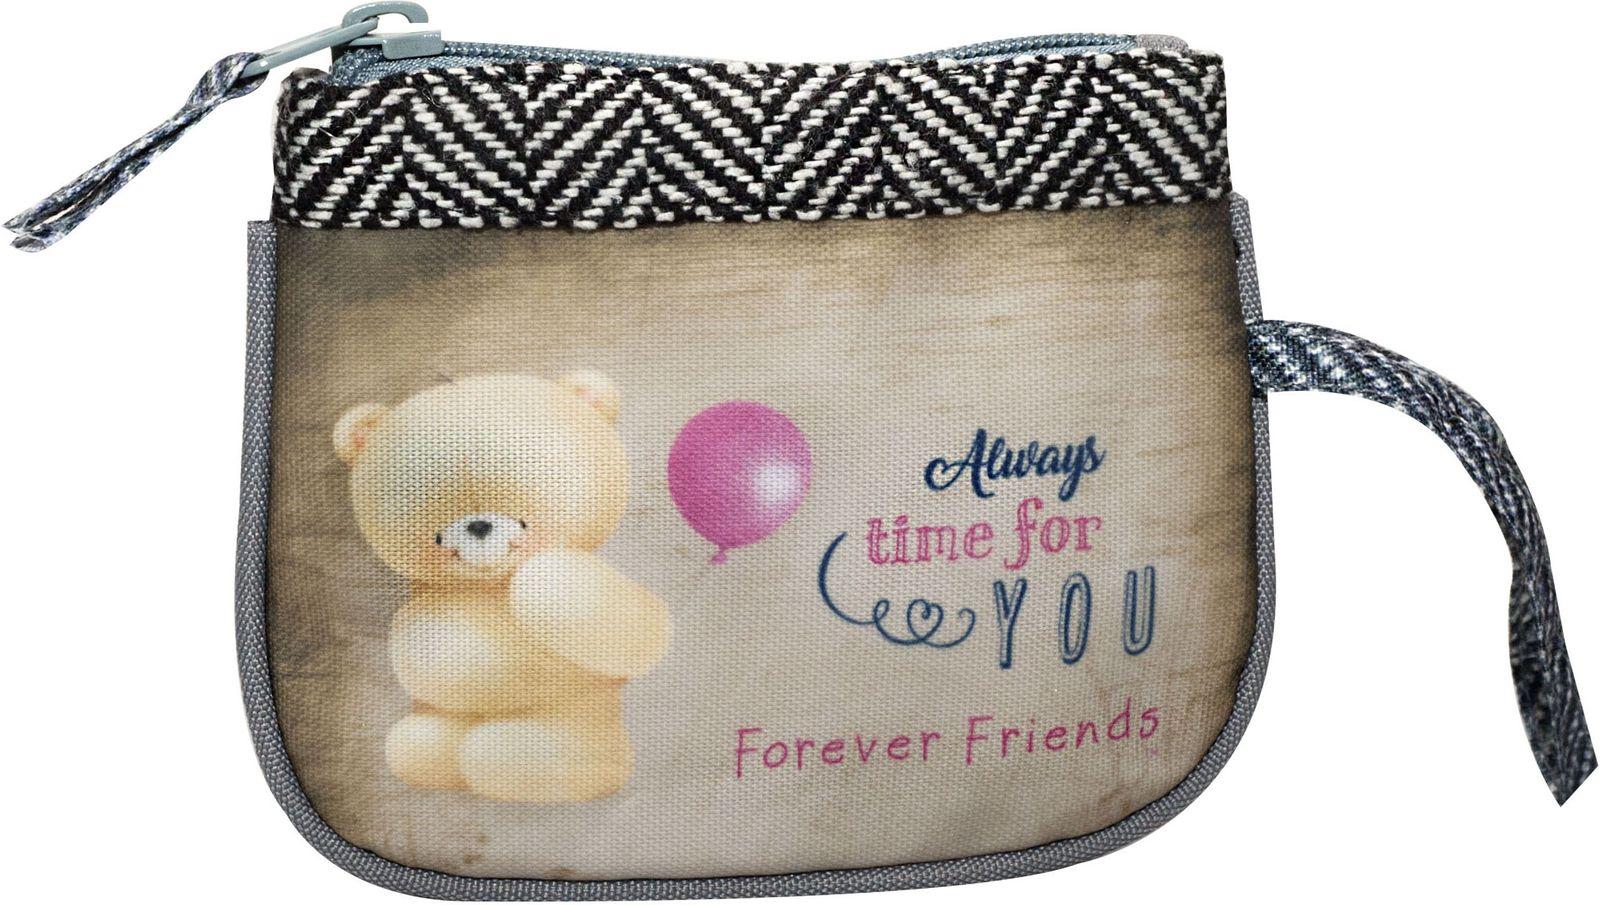 a734903467 Παιδί    Πορτοφολια    Teens    Πορτοφόλι Μικρό Forever Friends ...